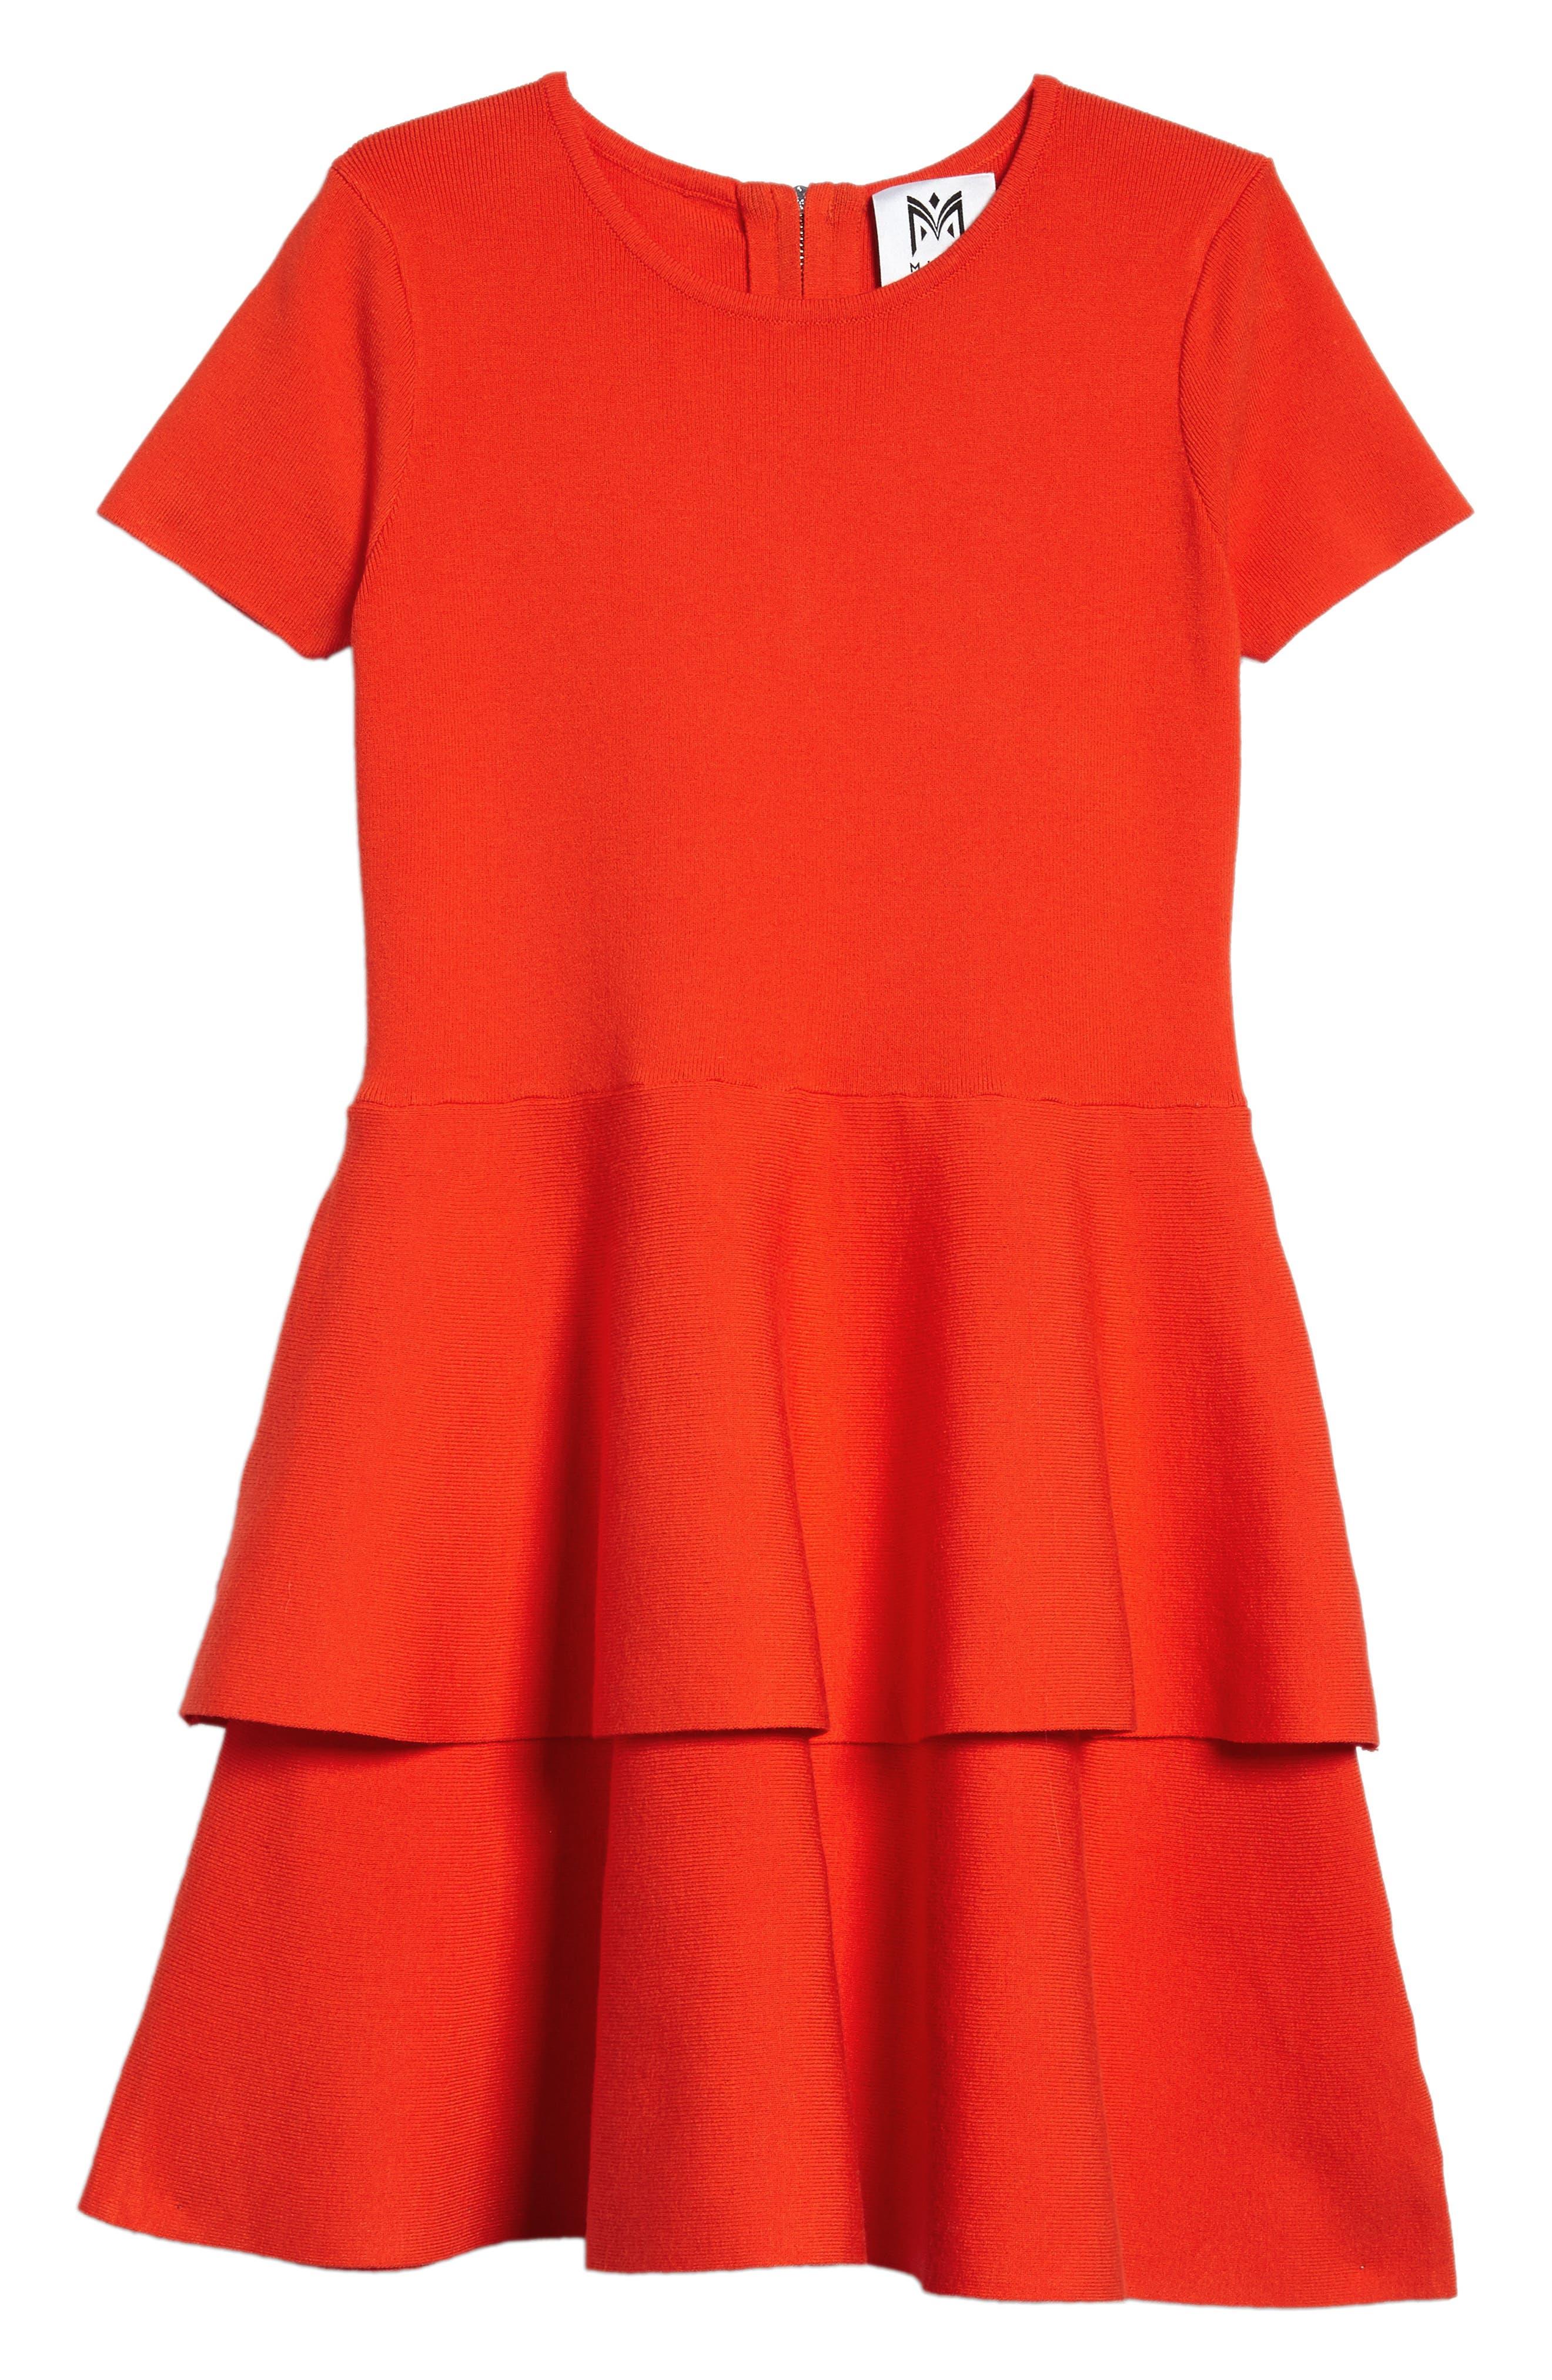 Tiered Dress,                             Main thumbnail 1, color,                             620